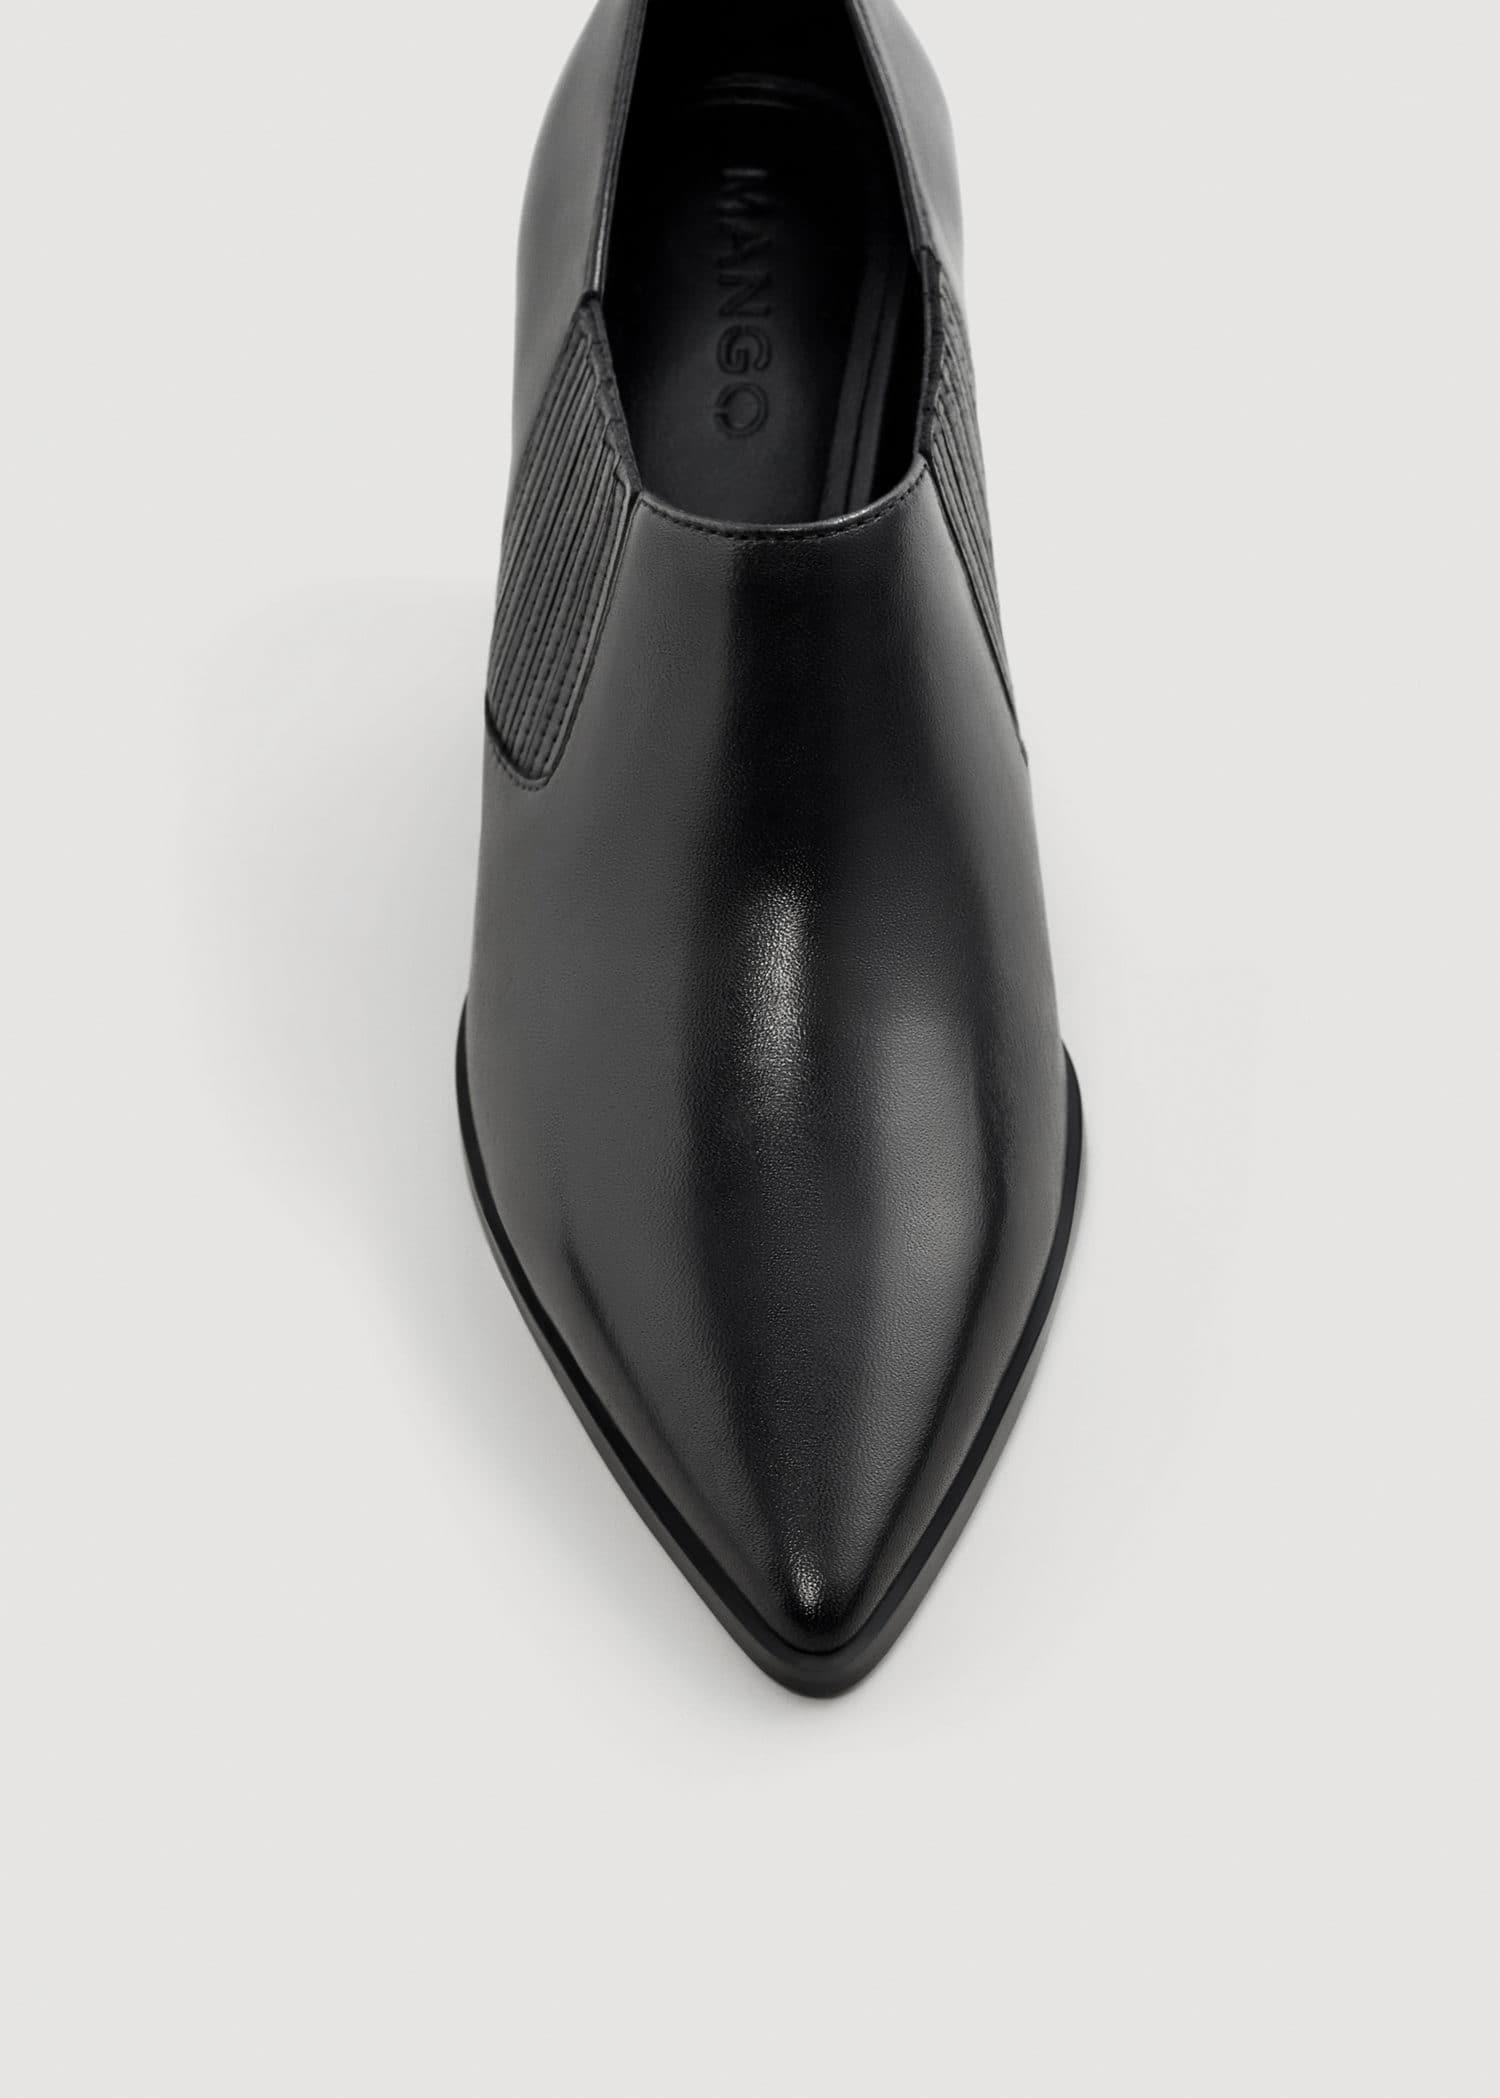 Zapatillas 2018 varios diseños sitio oficial Botín piel tacón - Mujer | OUTLET España